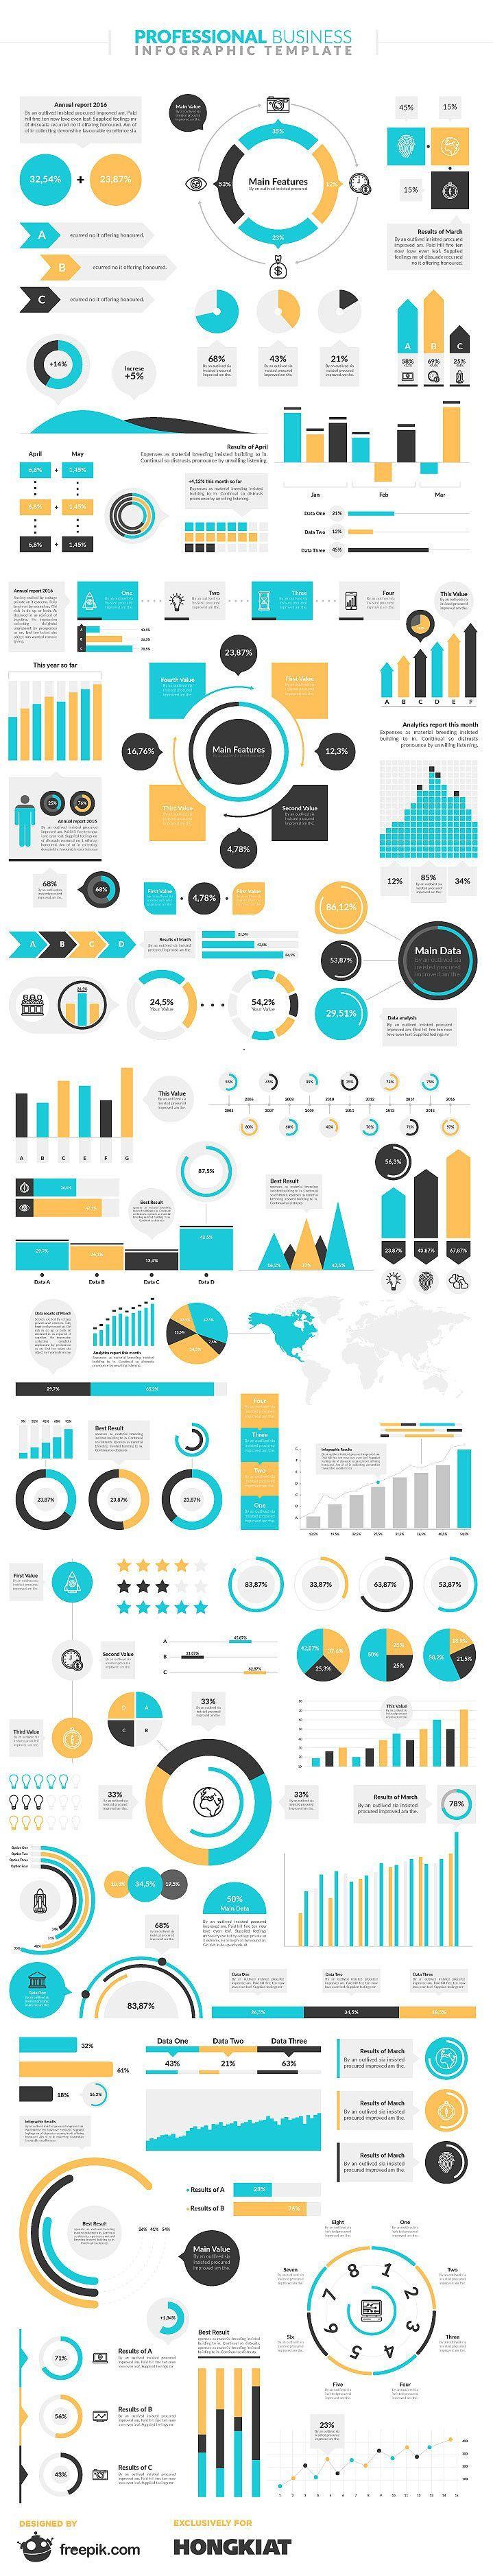 40 best art infographics images on pinterest info graphics freebie professional business infographic template chart designppt design graph alramifo Gallery